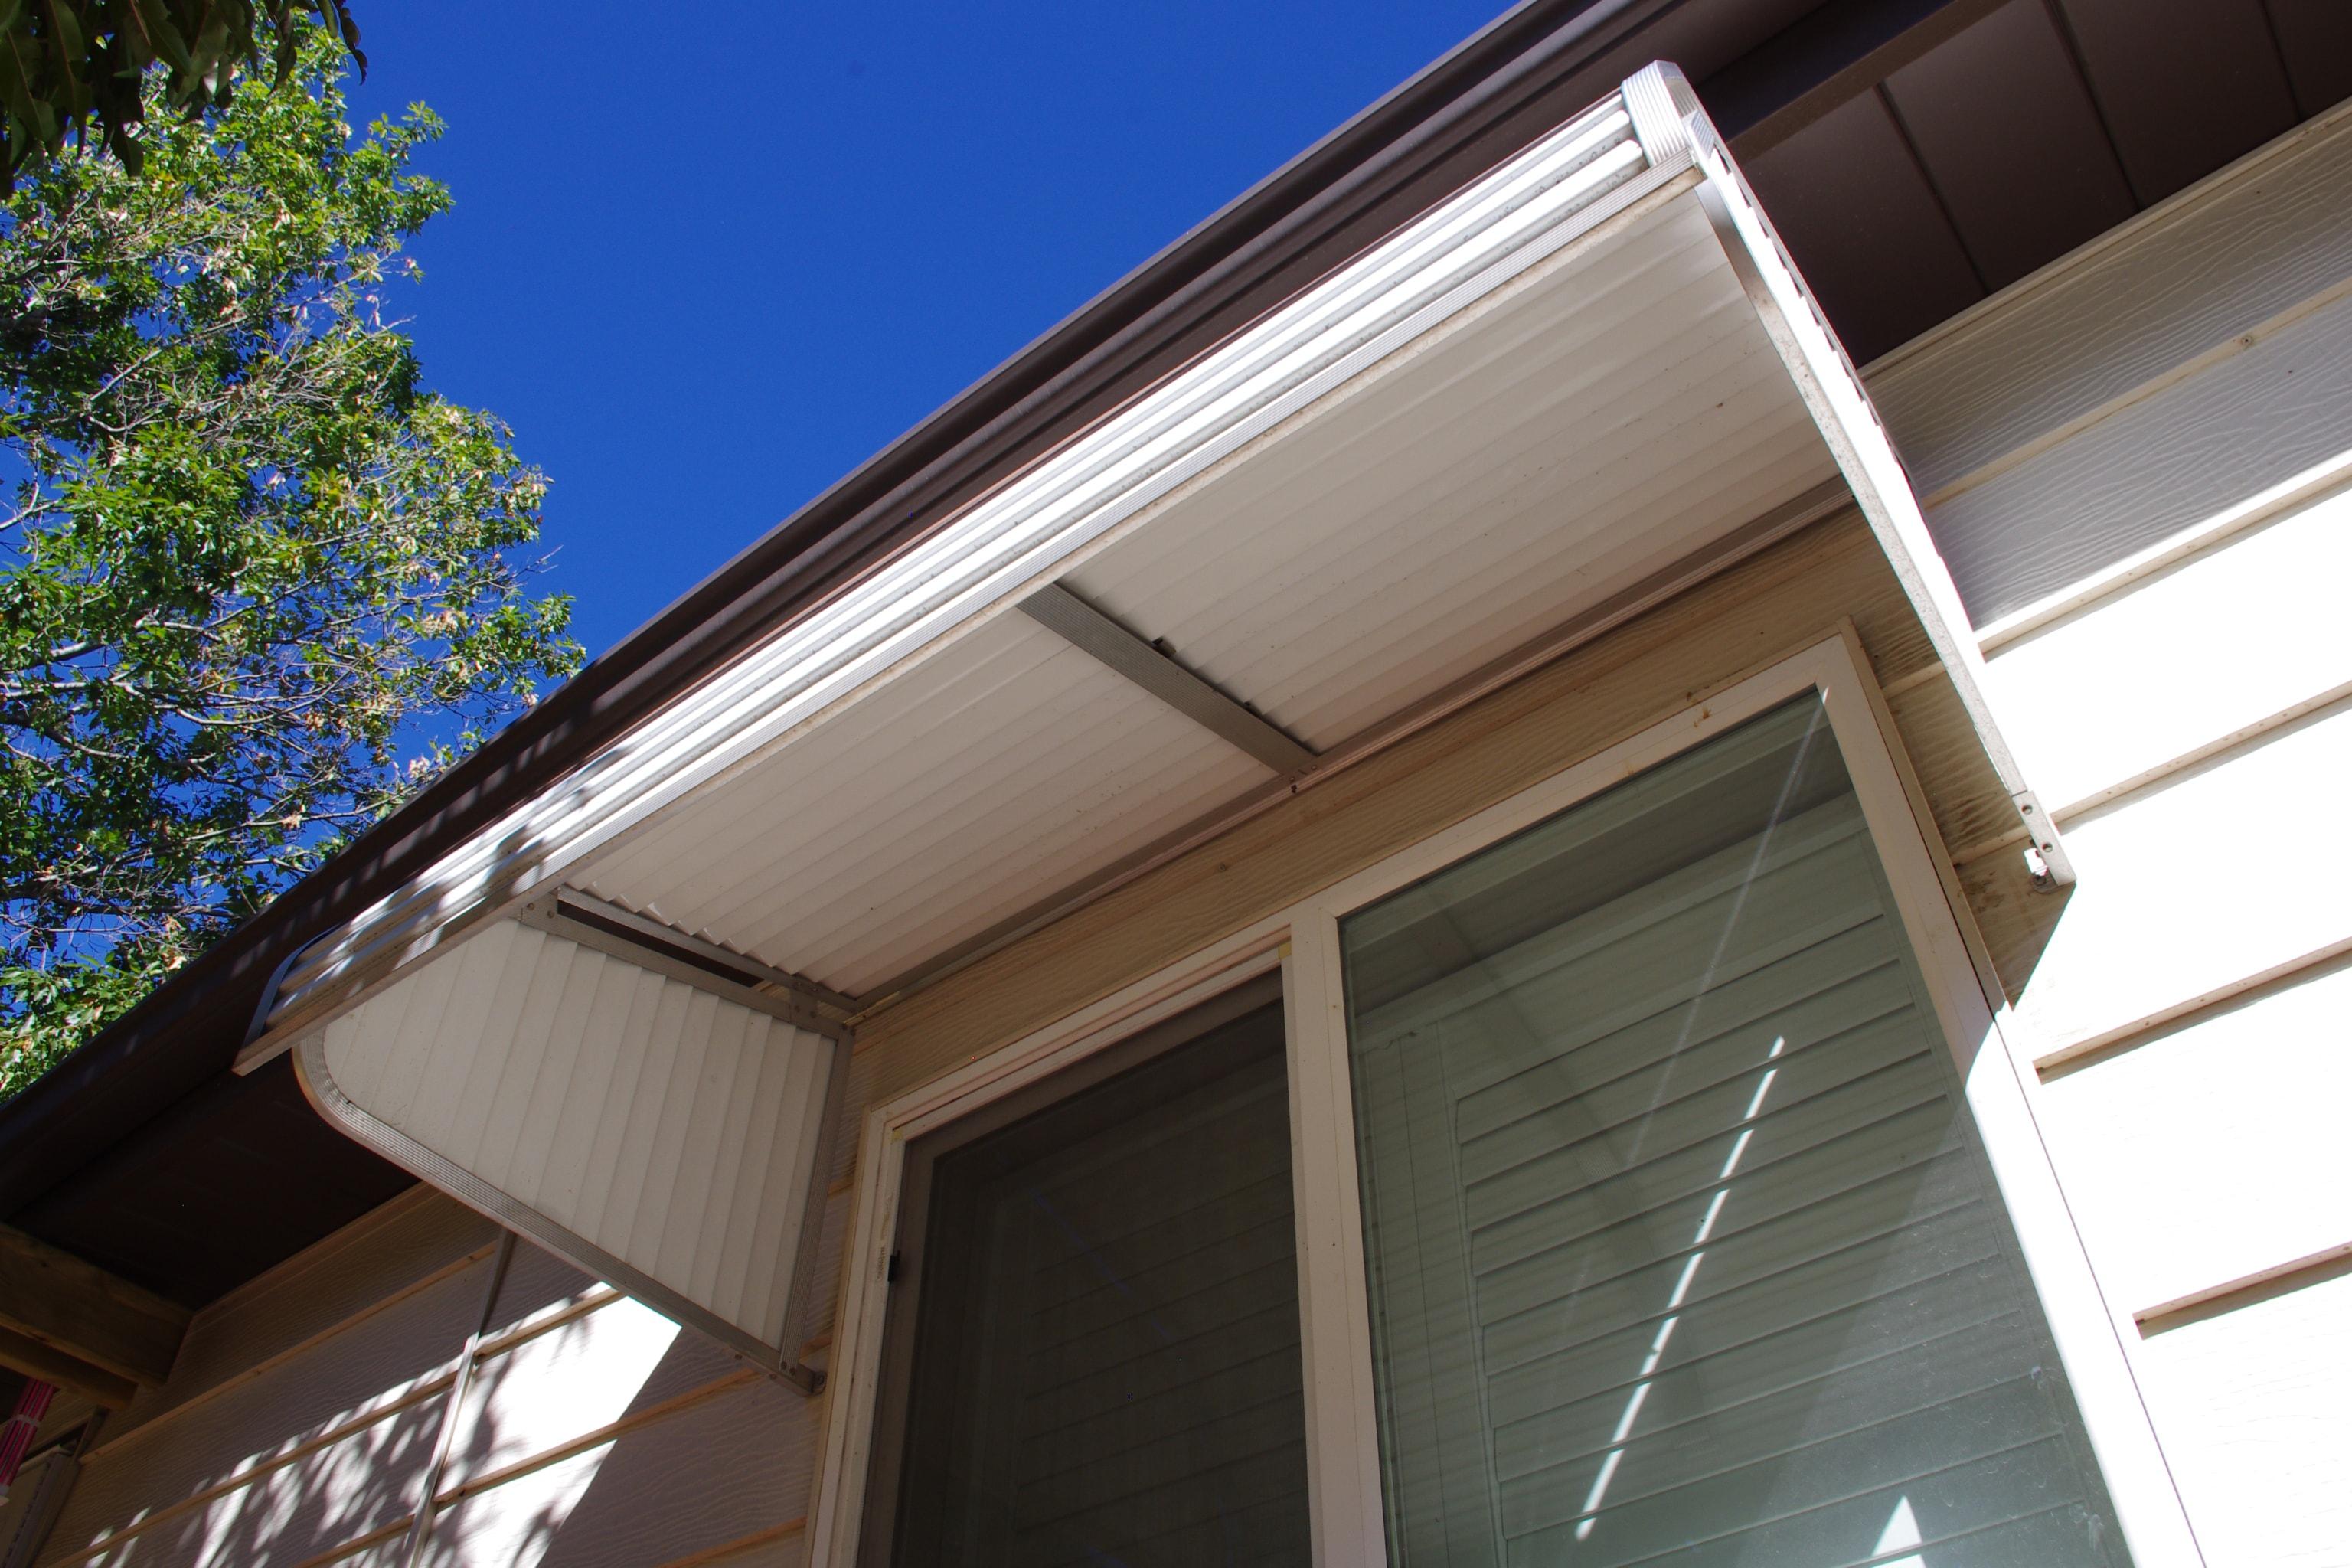 4500 Series Casement Window Awning